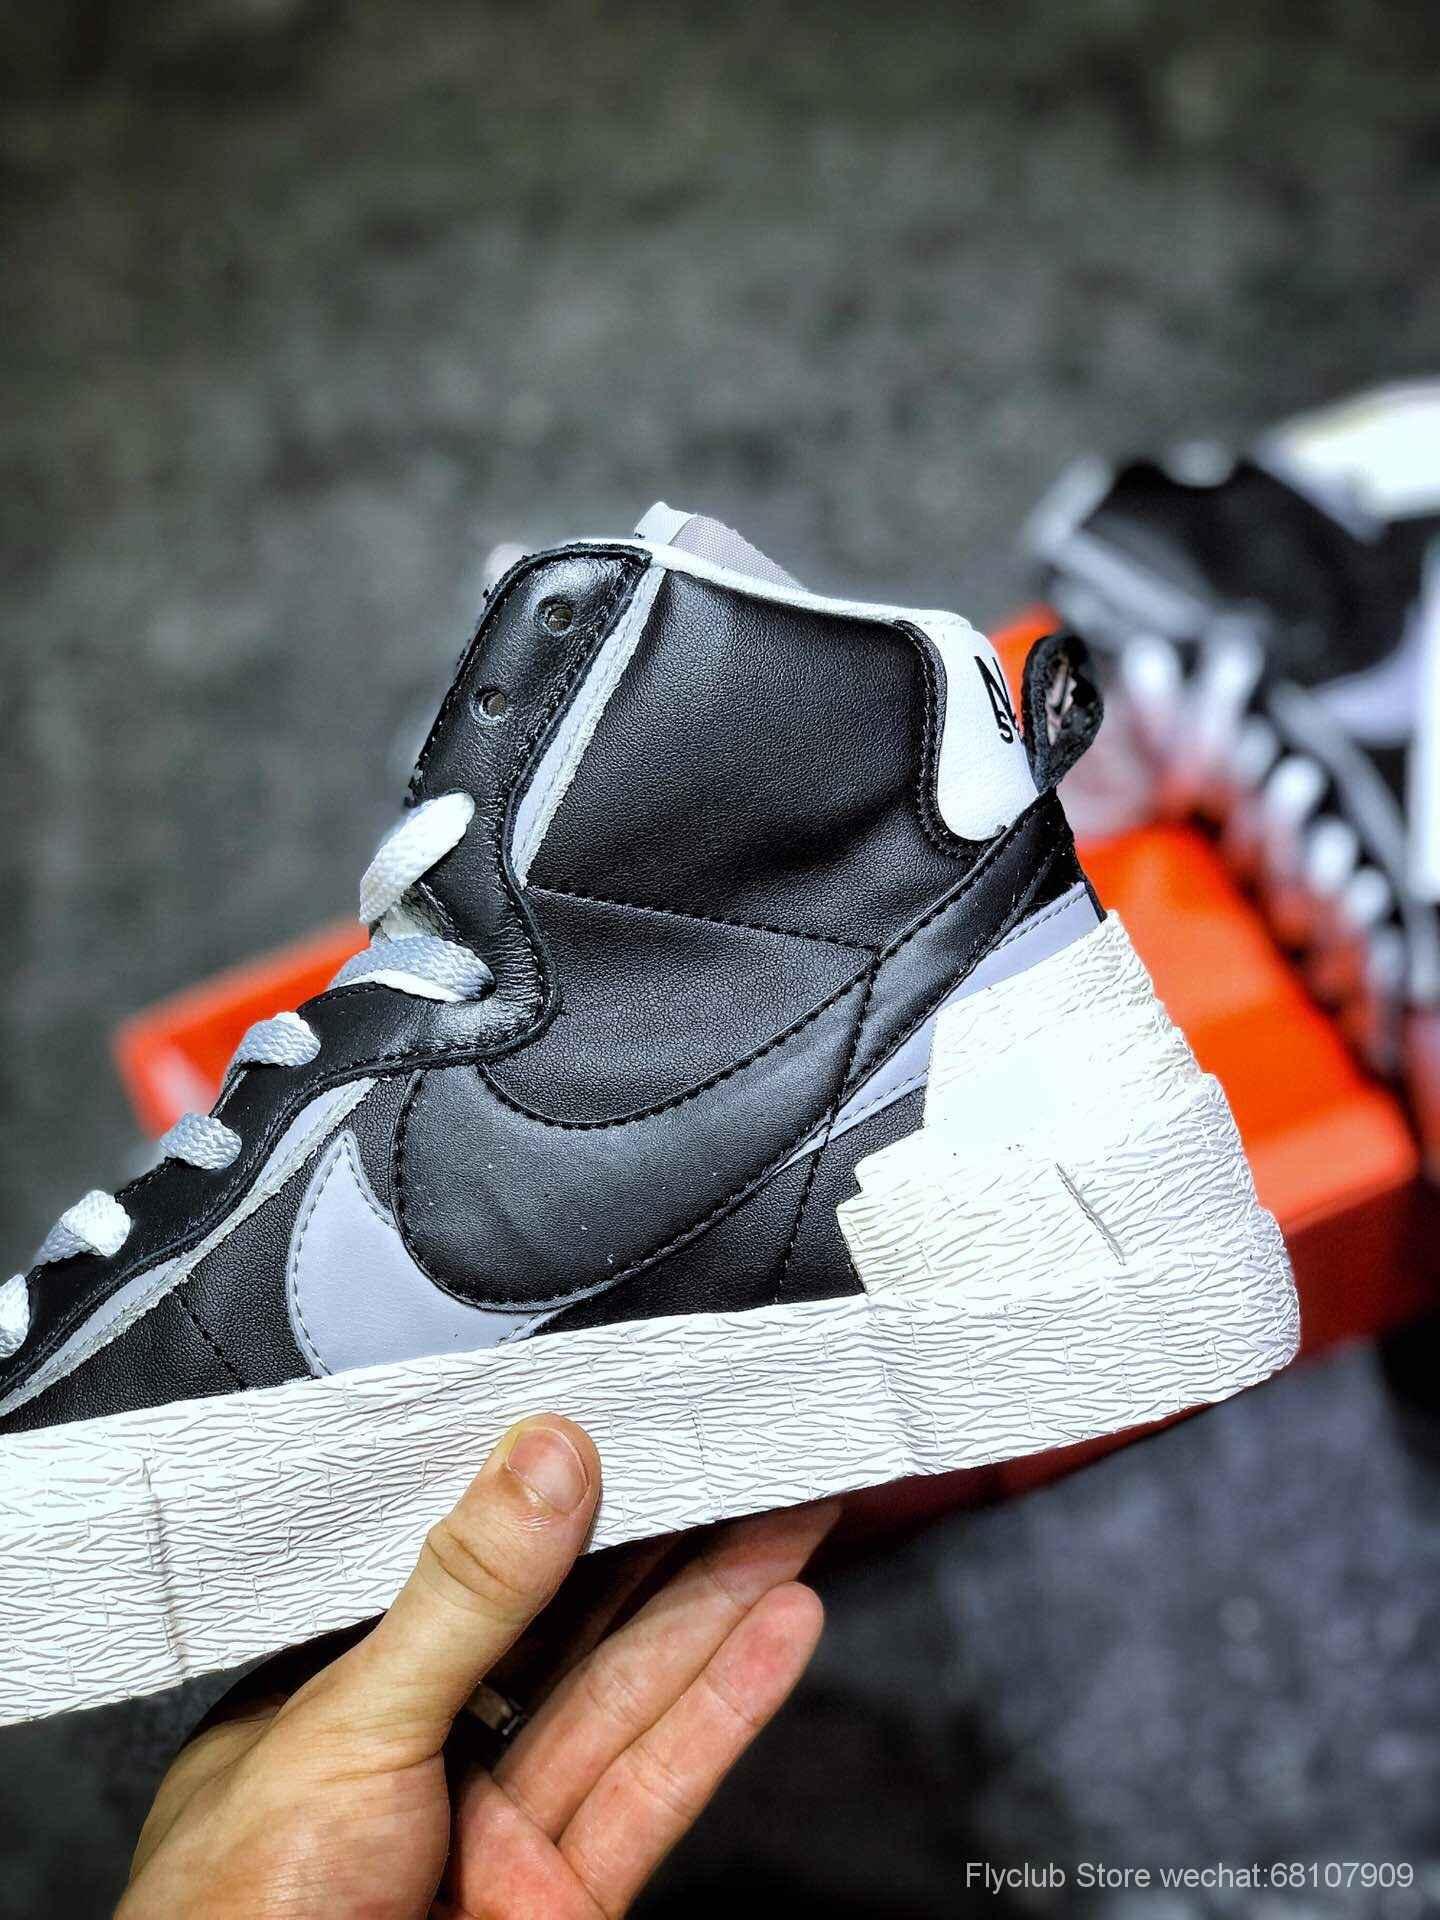 flyclub #top纯原 黑灰新配色‼️Sacai X Nike Blazer with Dunk ,开拓者 联名走秀款解构高端潮流, 双钩开拓者